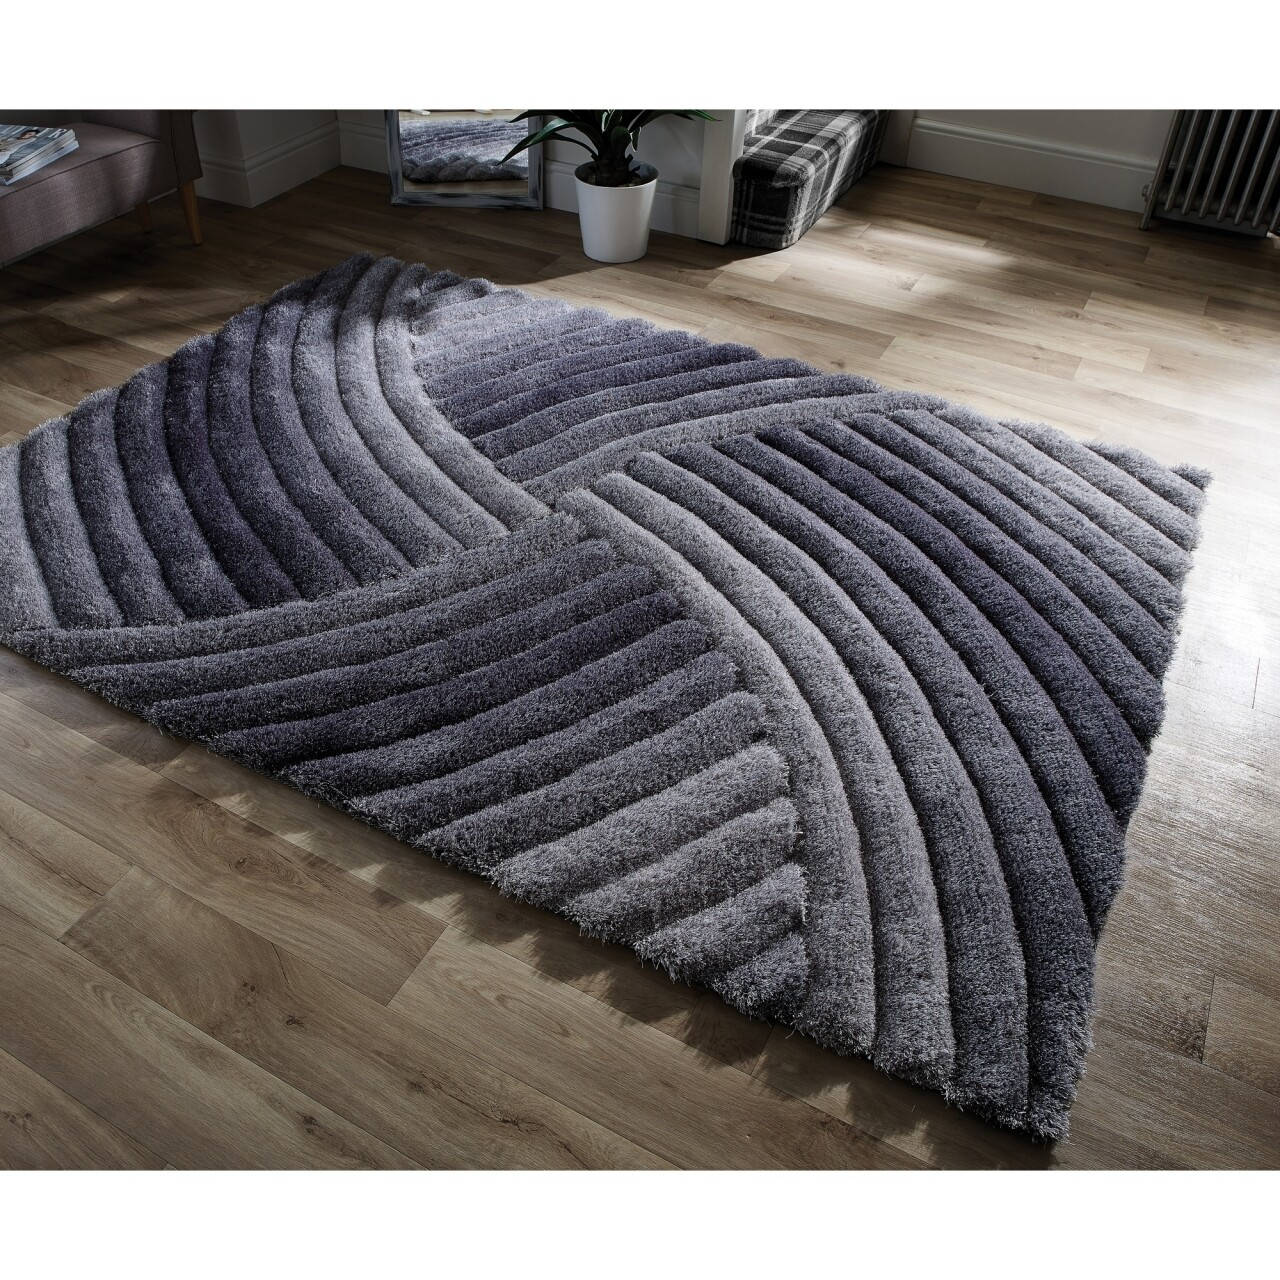 Covor Verge Furrow Grey 80X150 cm